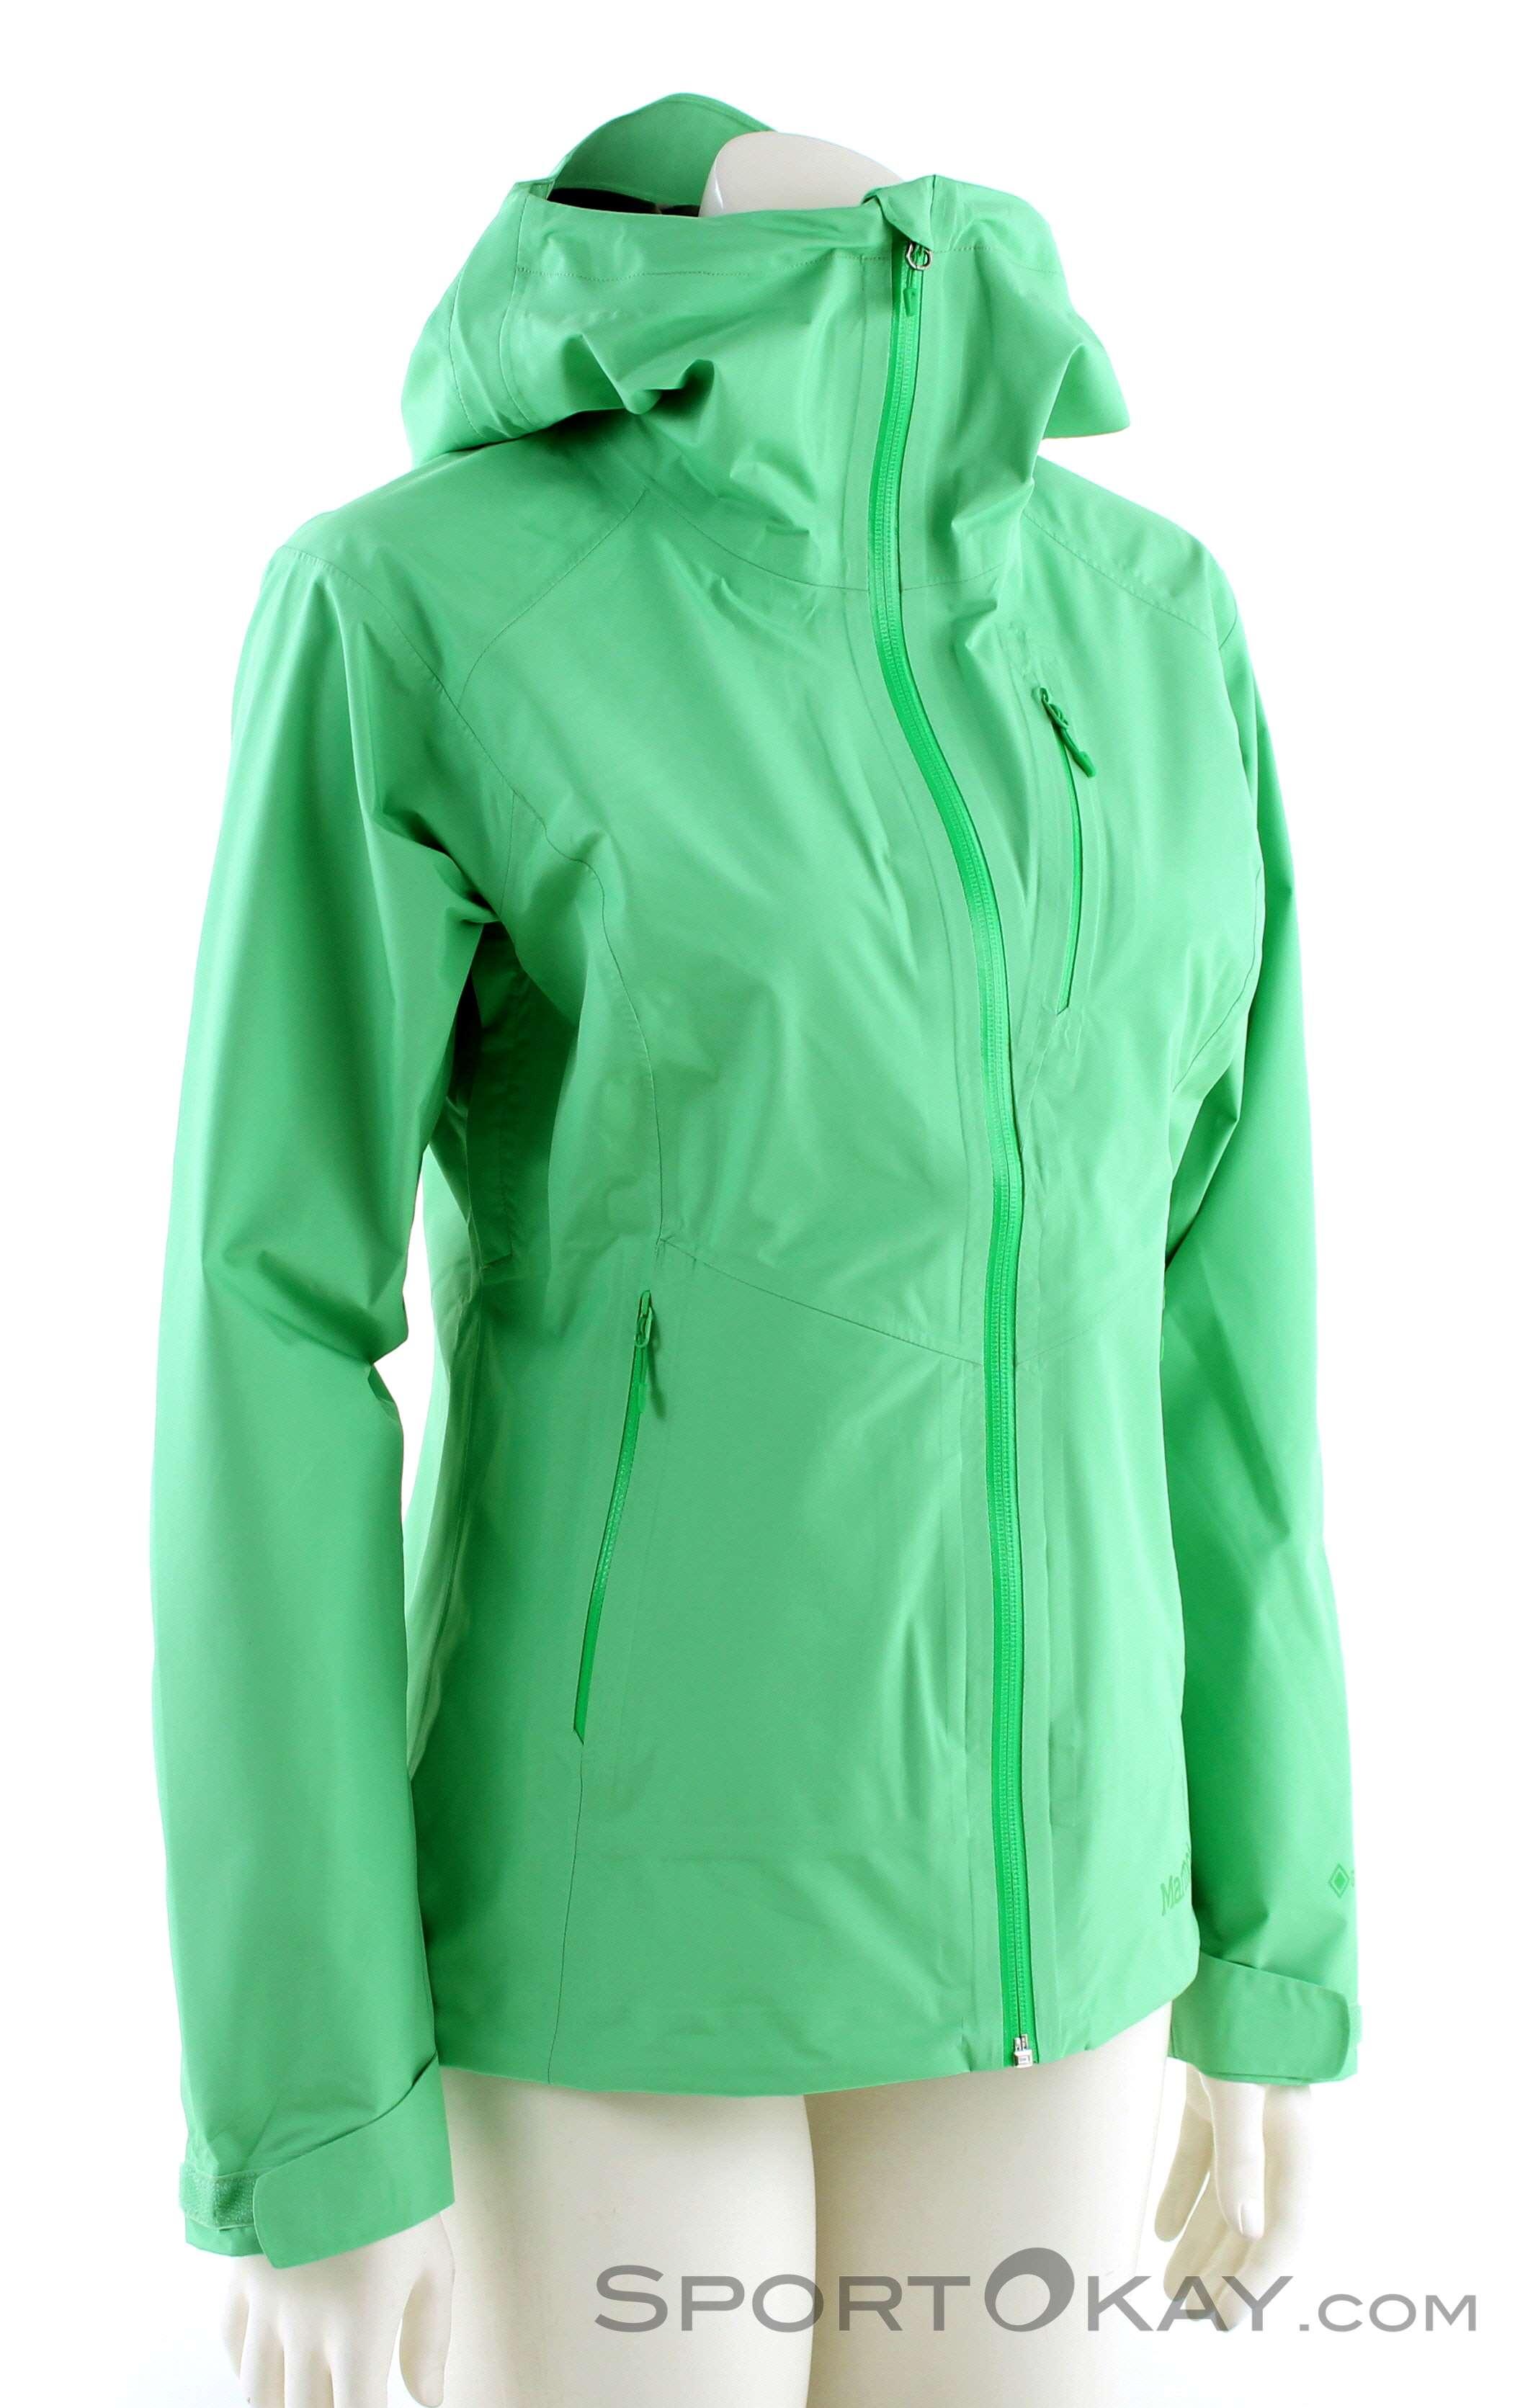 Marmot Knife Edge Jacket Womens Outdoor Jacket Jackets